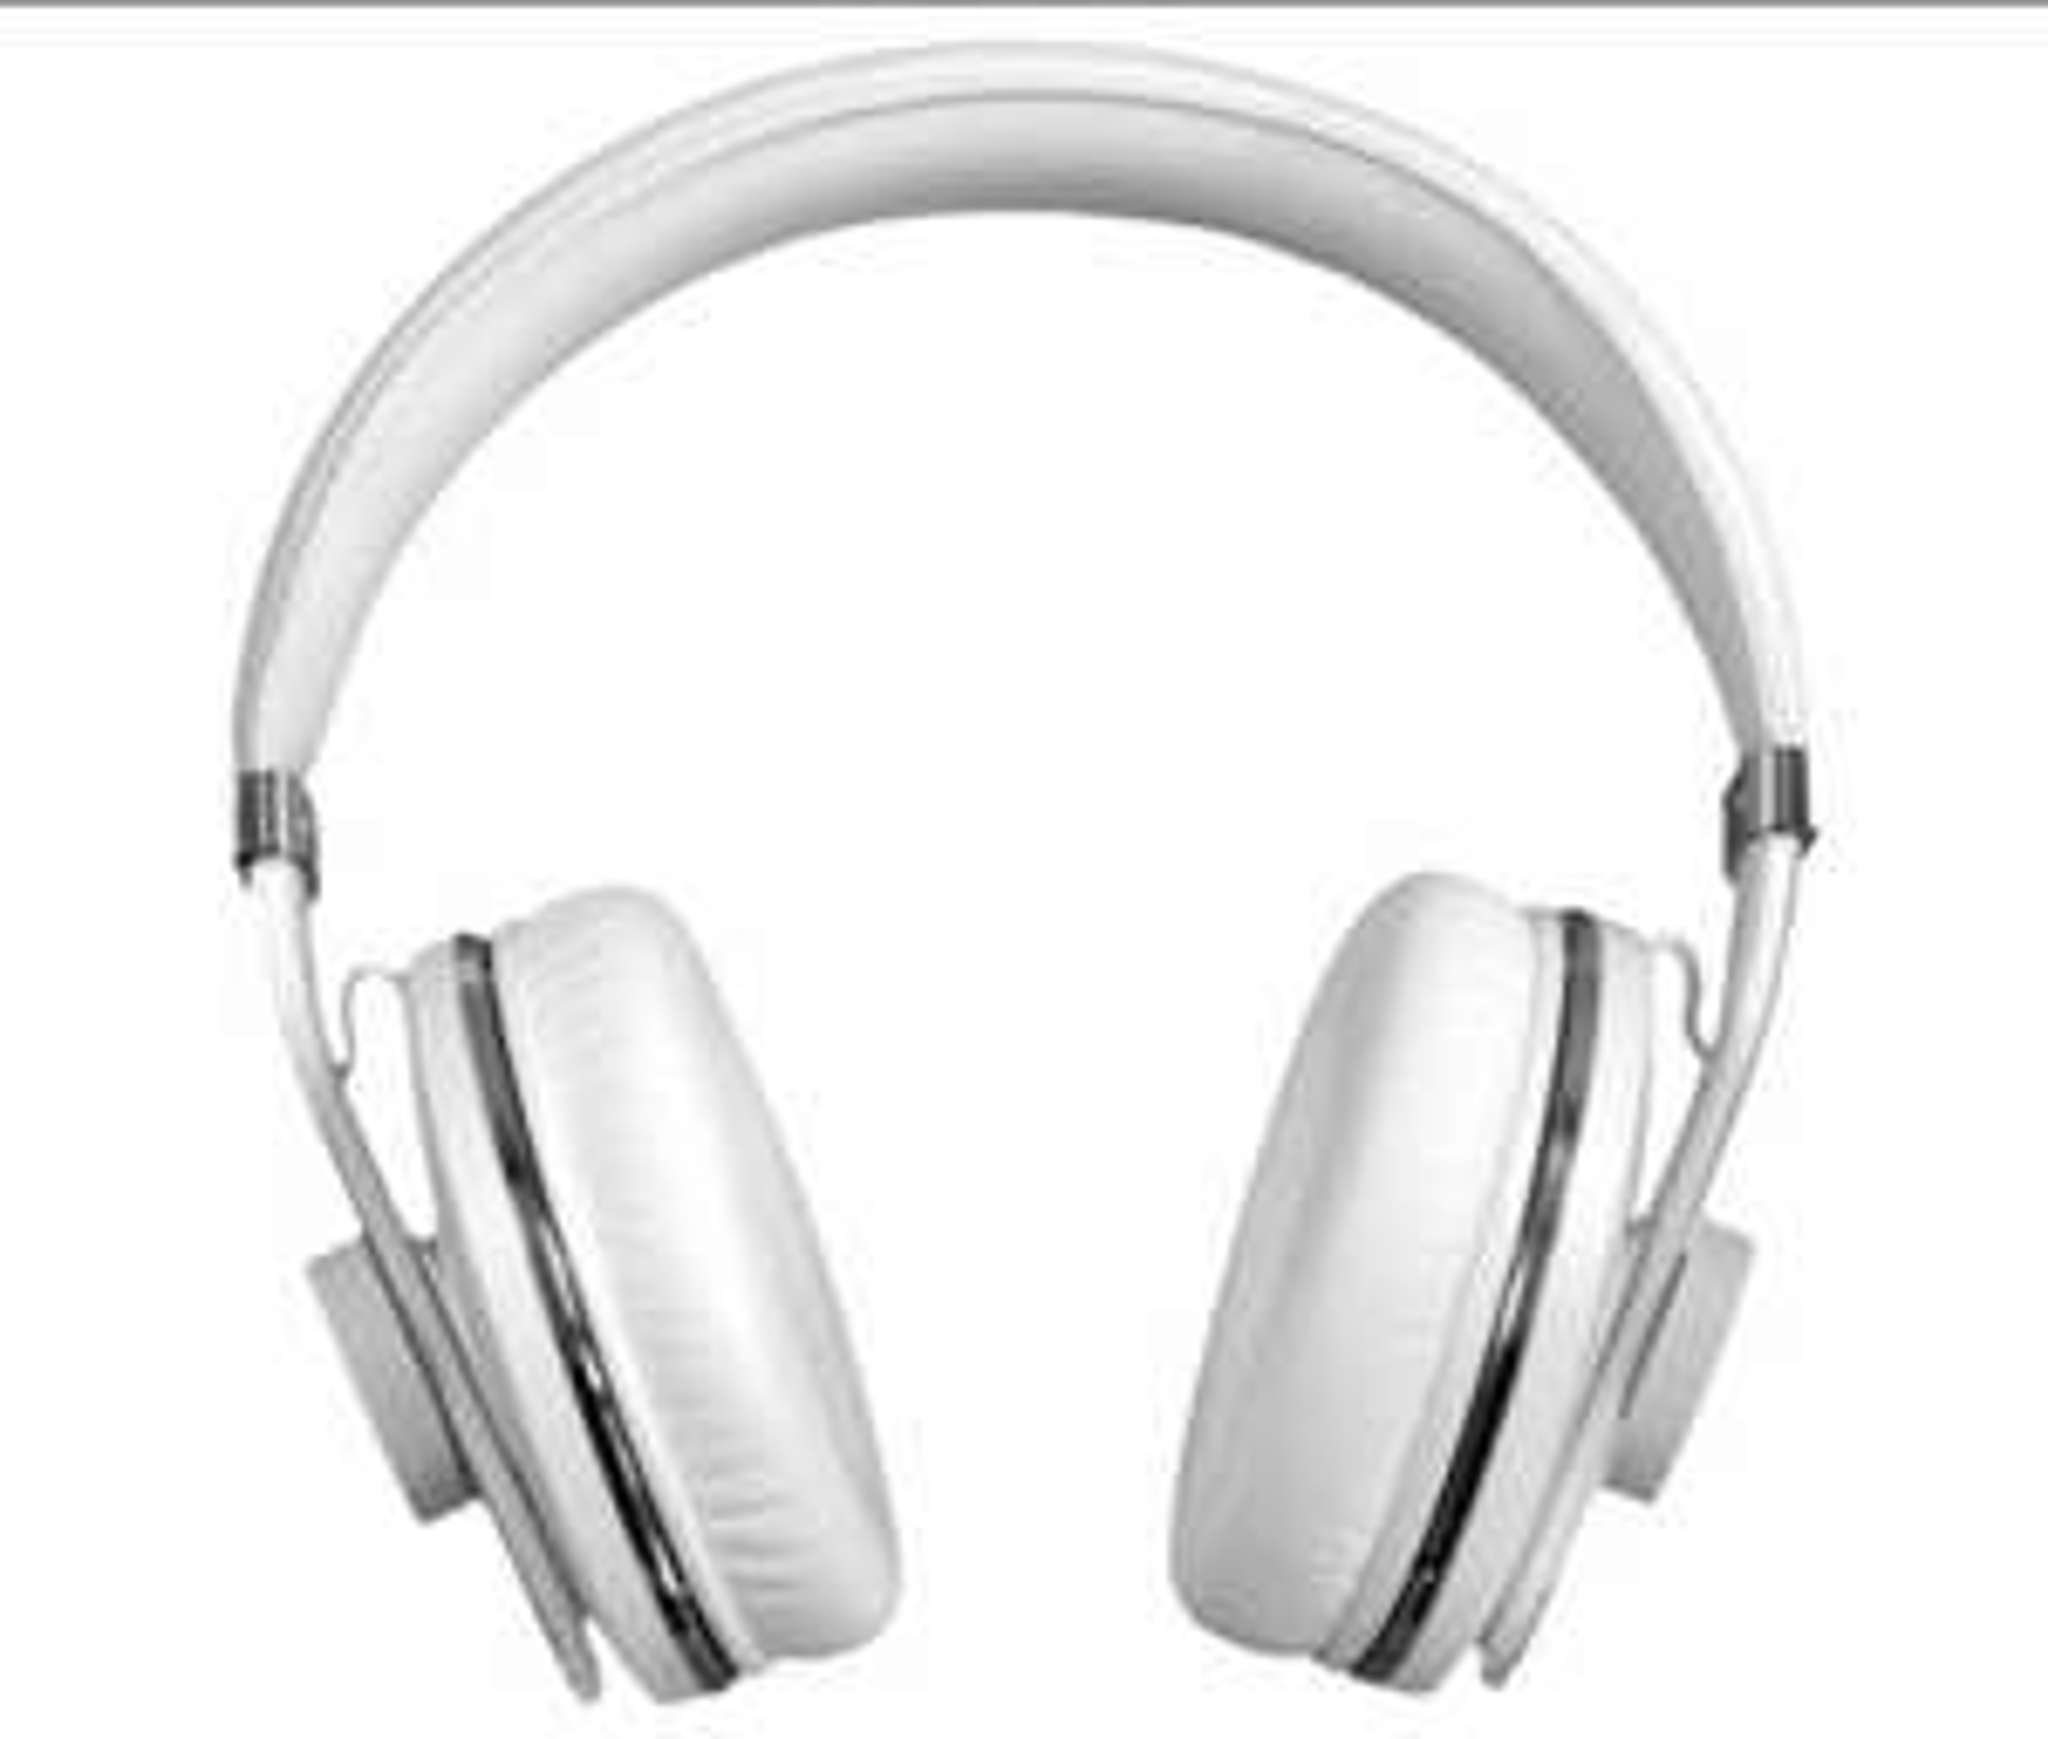 Finlux Bluetooth headphones with built in microphone £16.99 valuestoresuk ebay